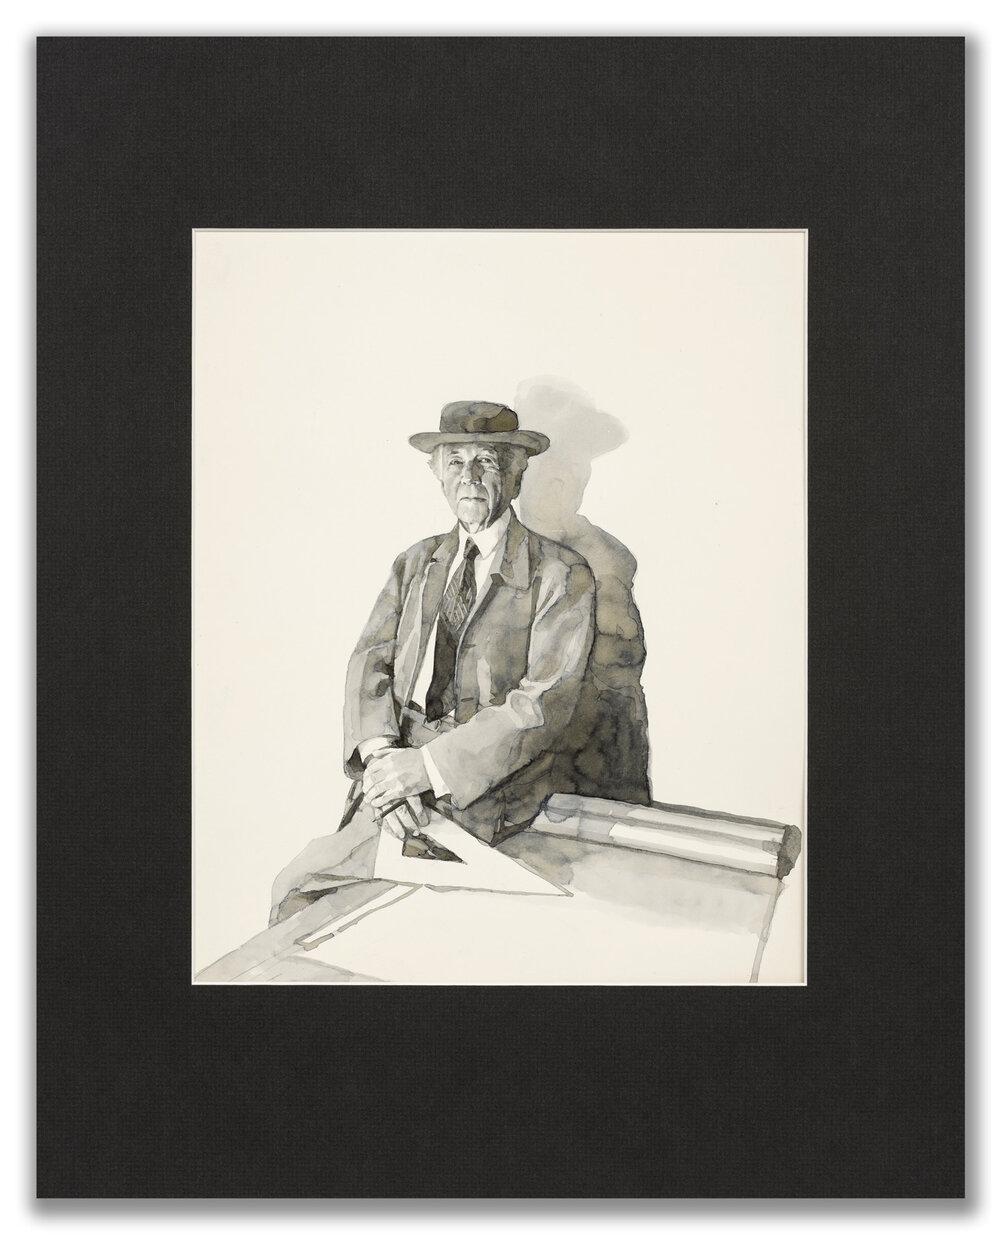 Michael Leonard, (British b.1933), A Good Age; Frank Lloud Wright, 1977.